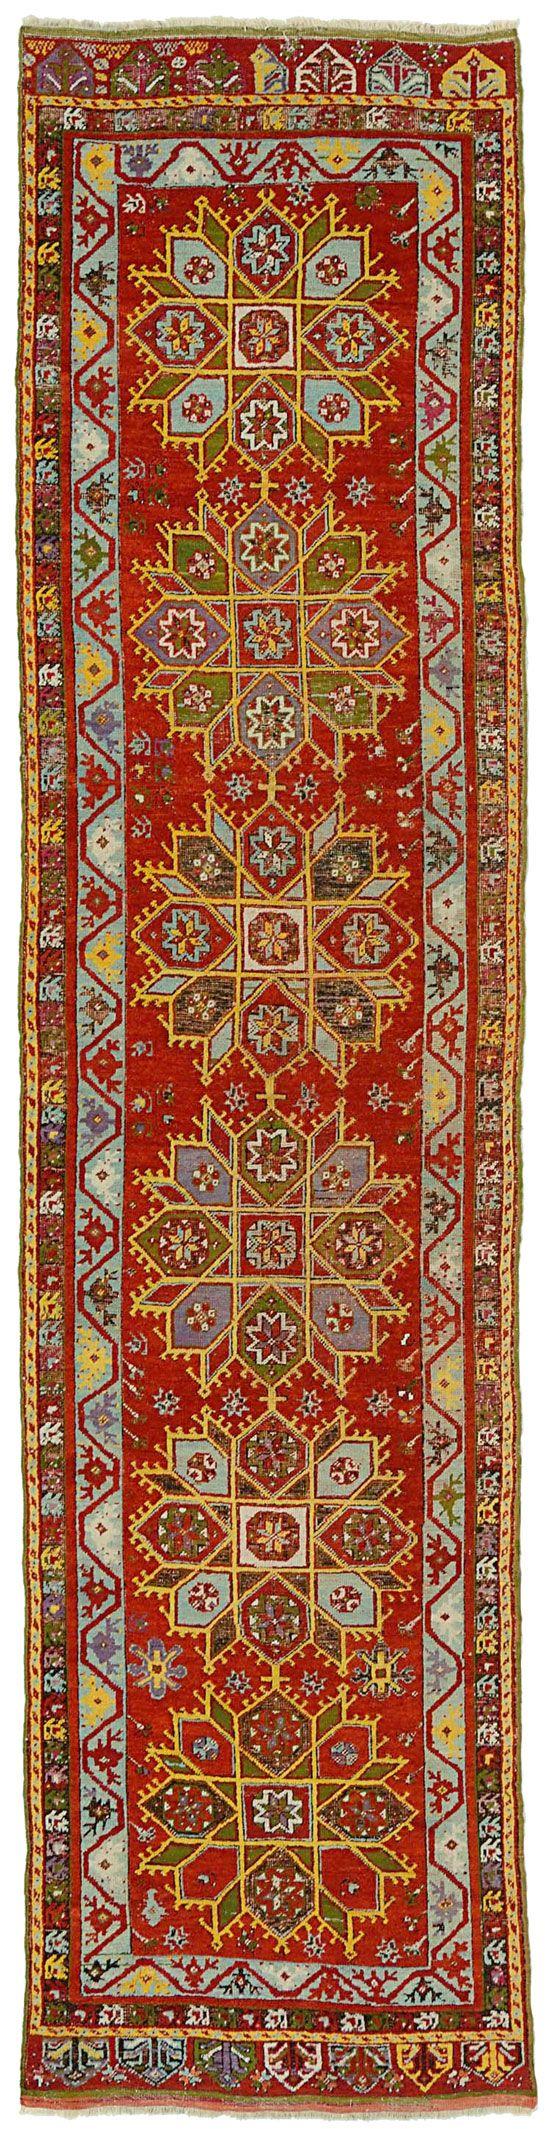 "ANTIQUE KIRSEHIR RUNNER  Turkey c1900     4.10m x 0.97m    13' 5"" x 3' 2""  I Robert Stephenson handmade carpets"